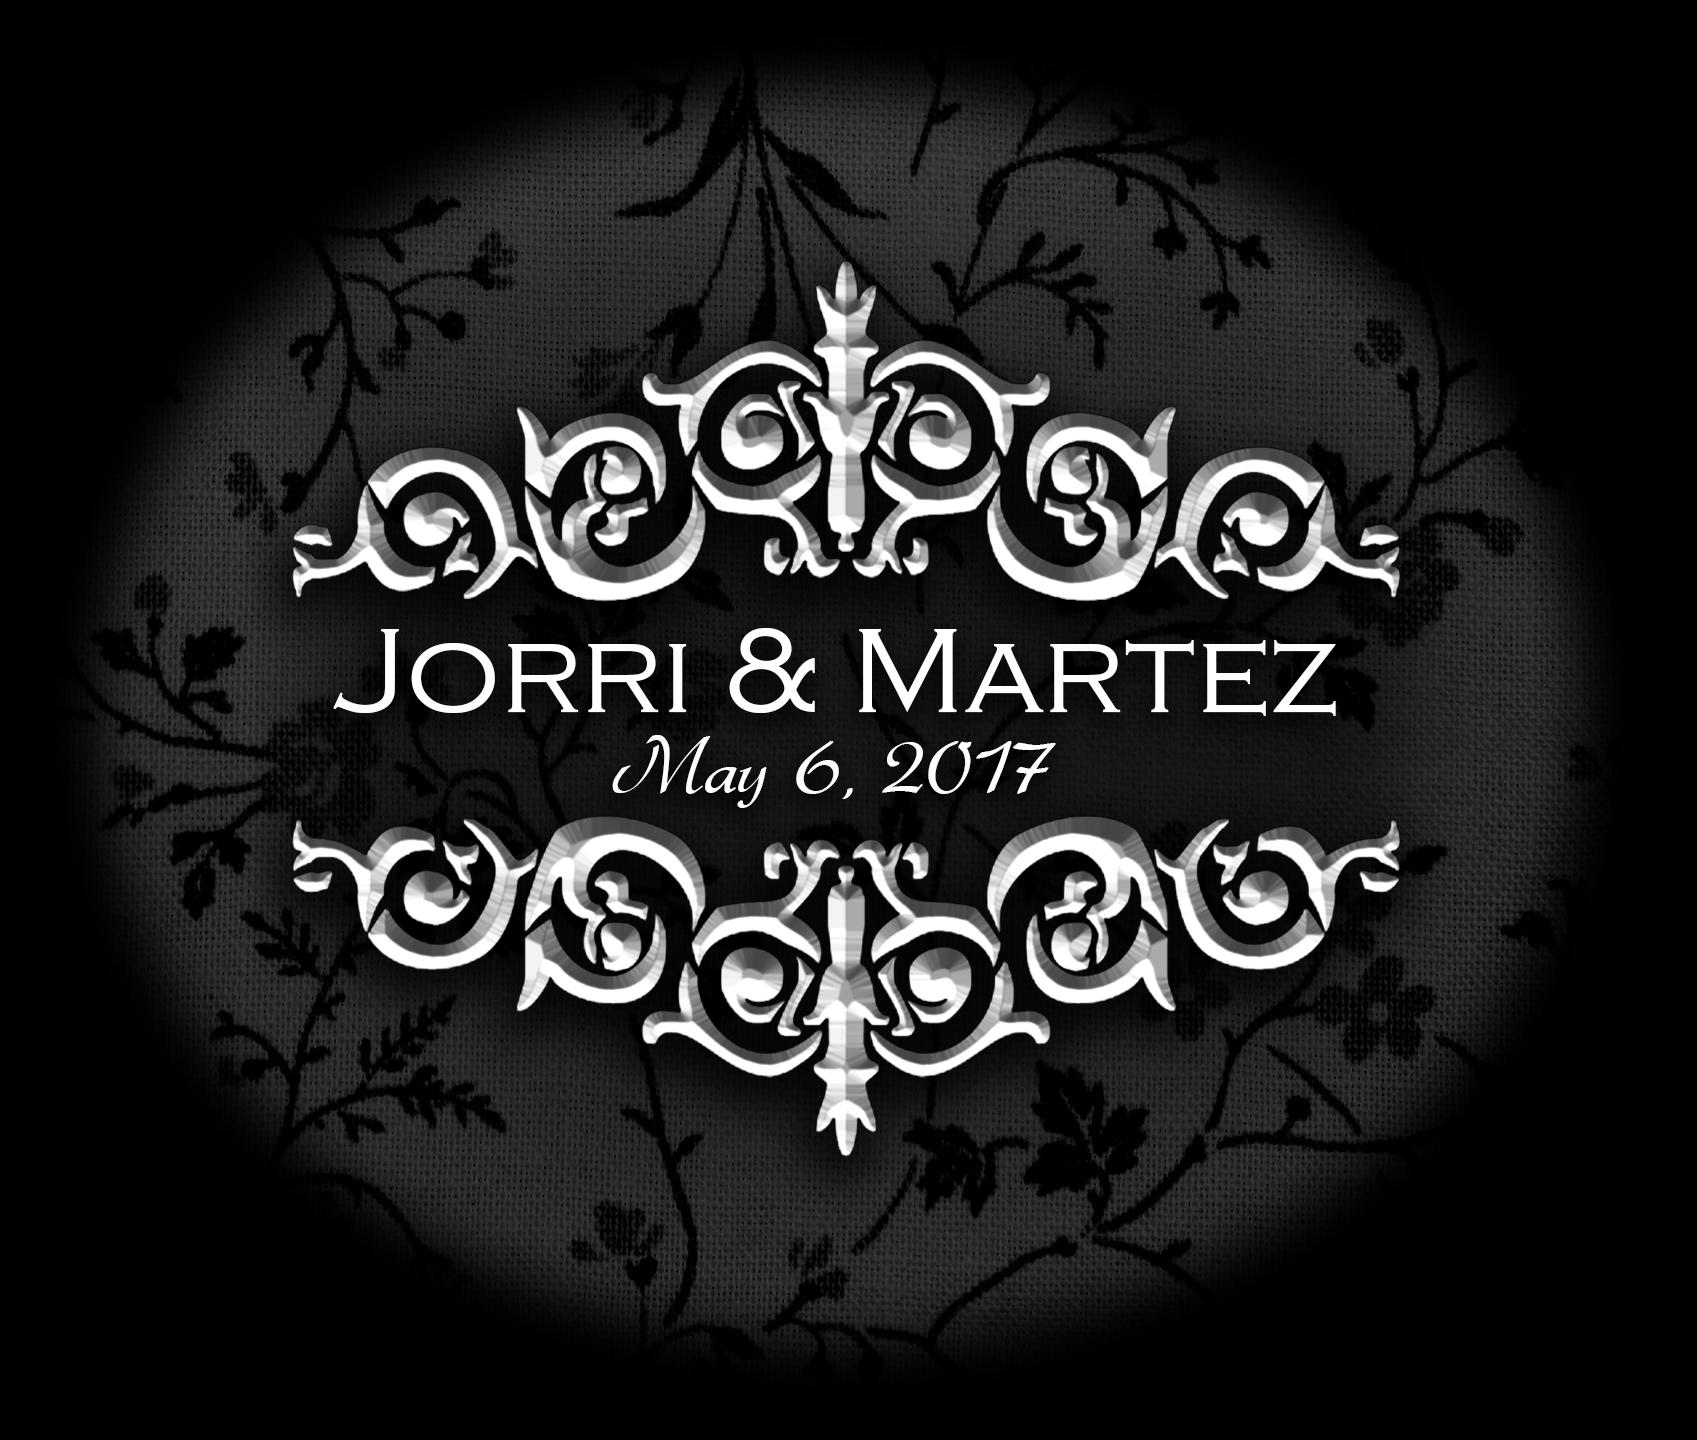 JORIandMARTEZ3.jpg